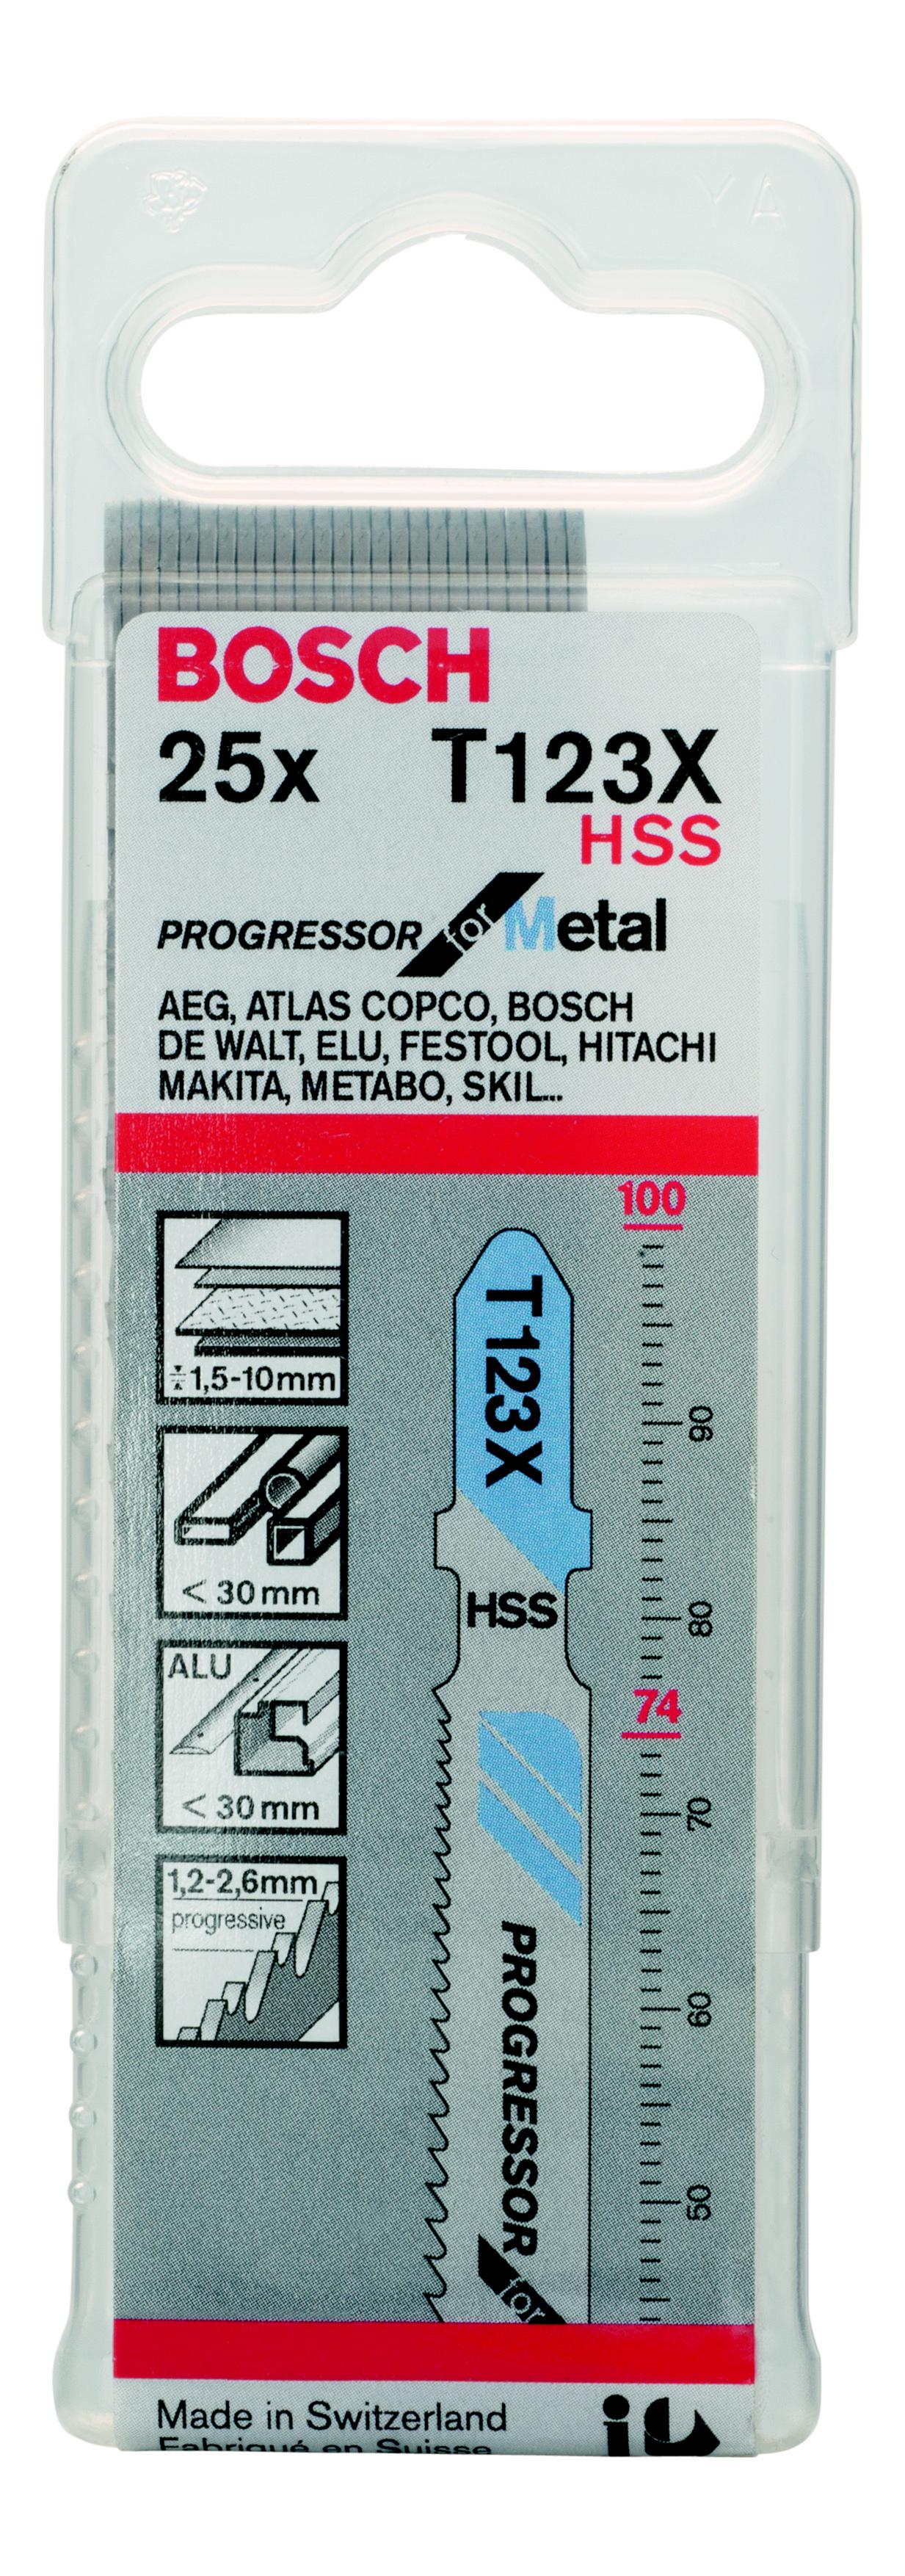 Пилки для лобзика Bosch 2608638474 пилки для лобзика bosch 2608637879